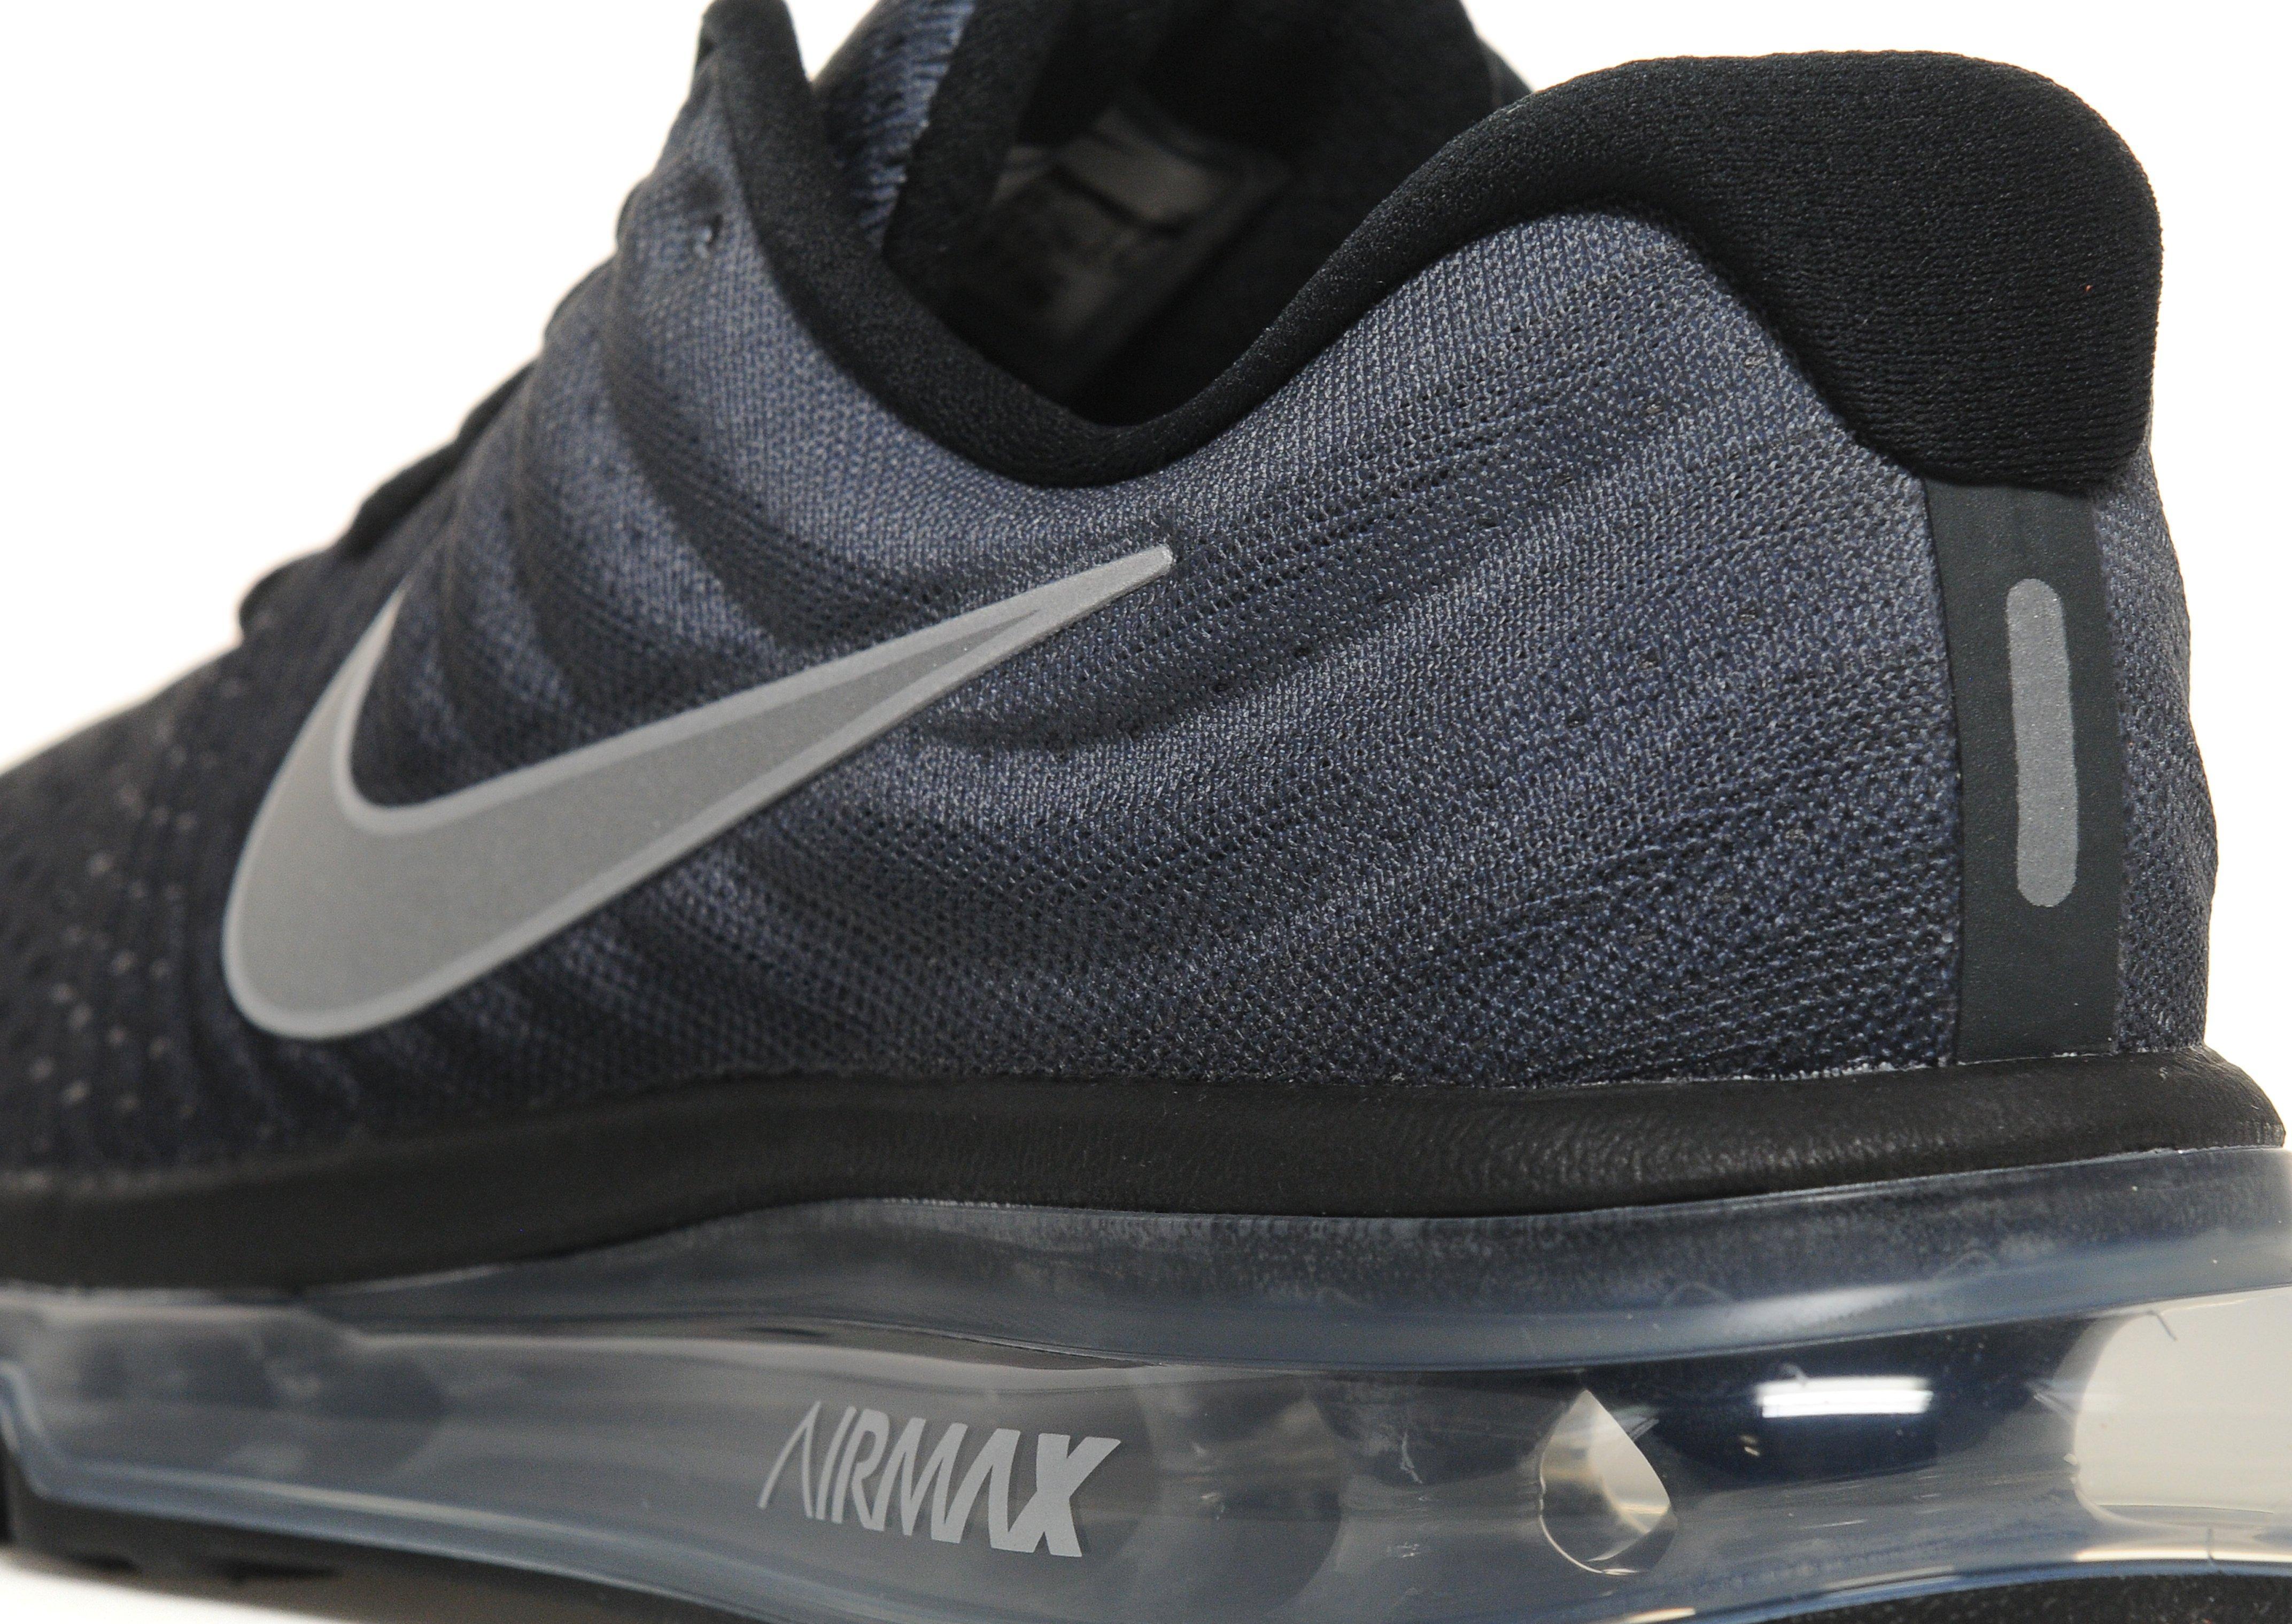 save off a7ba4 8f344 nike air max 2017 blanche et noir,BASKET Baskets NIKE Air Max 2017  Chaussures de Running Ho